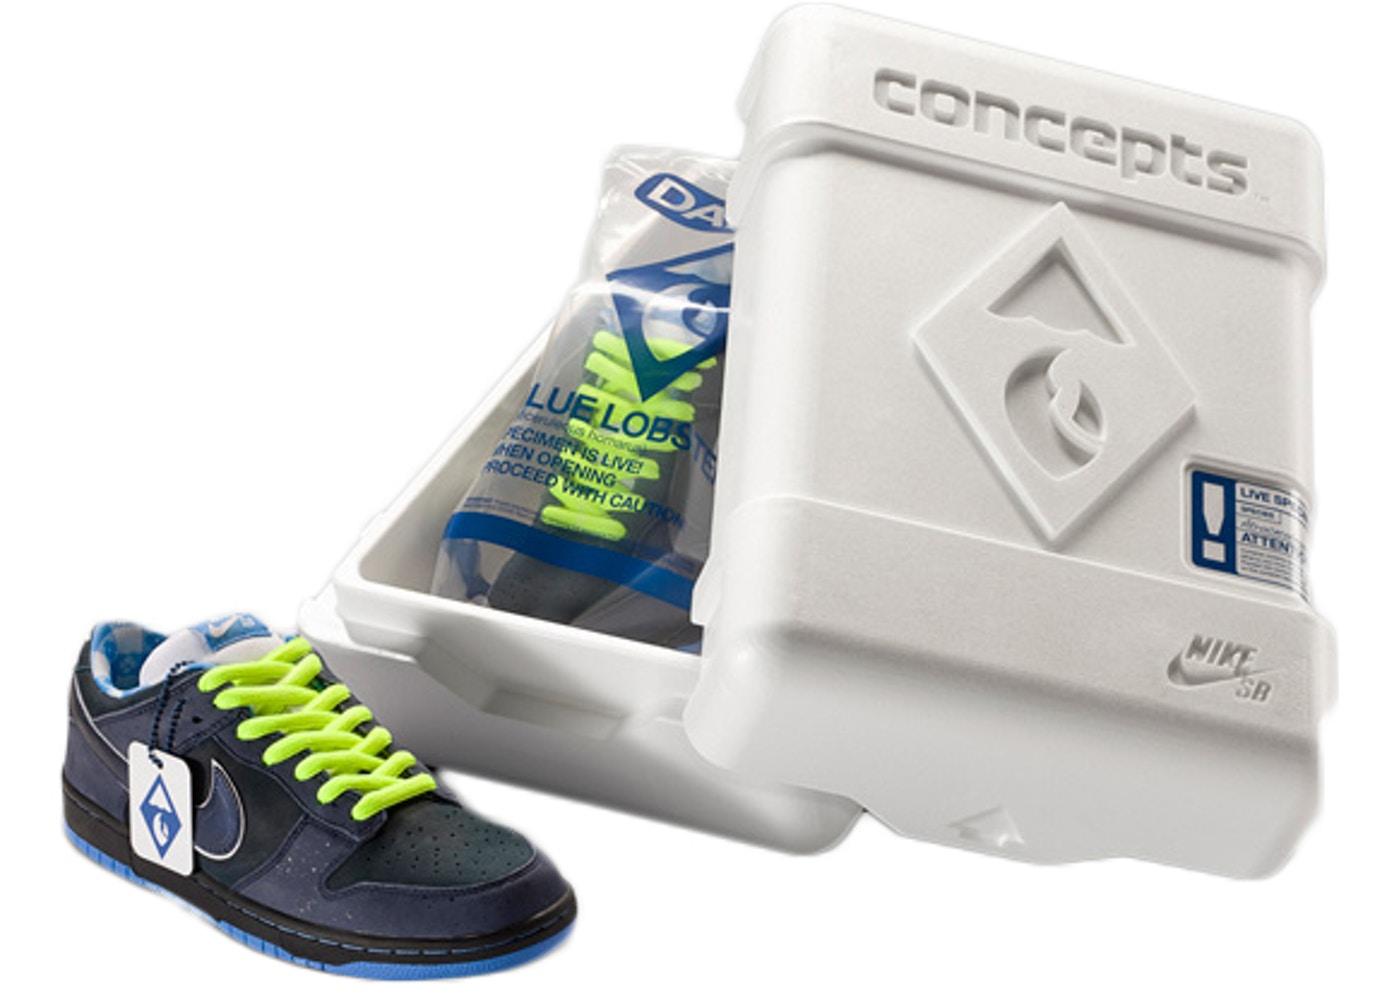 Nike-Dunk-SB-Low-Blue-Lobster-2009-Special-Box « d5293fc11